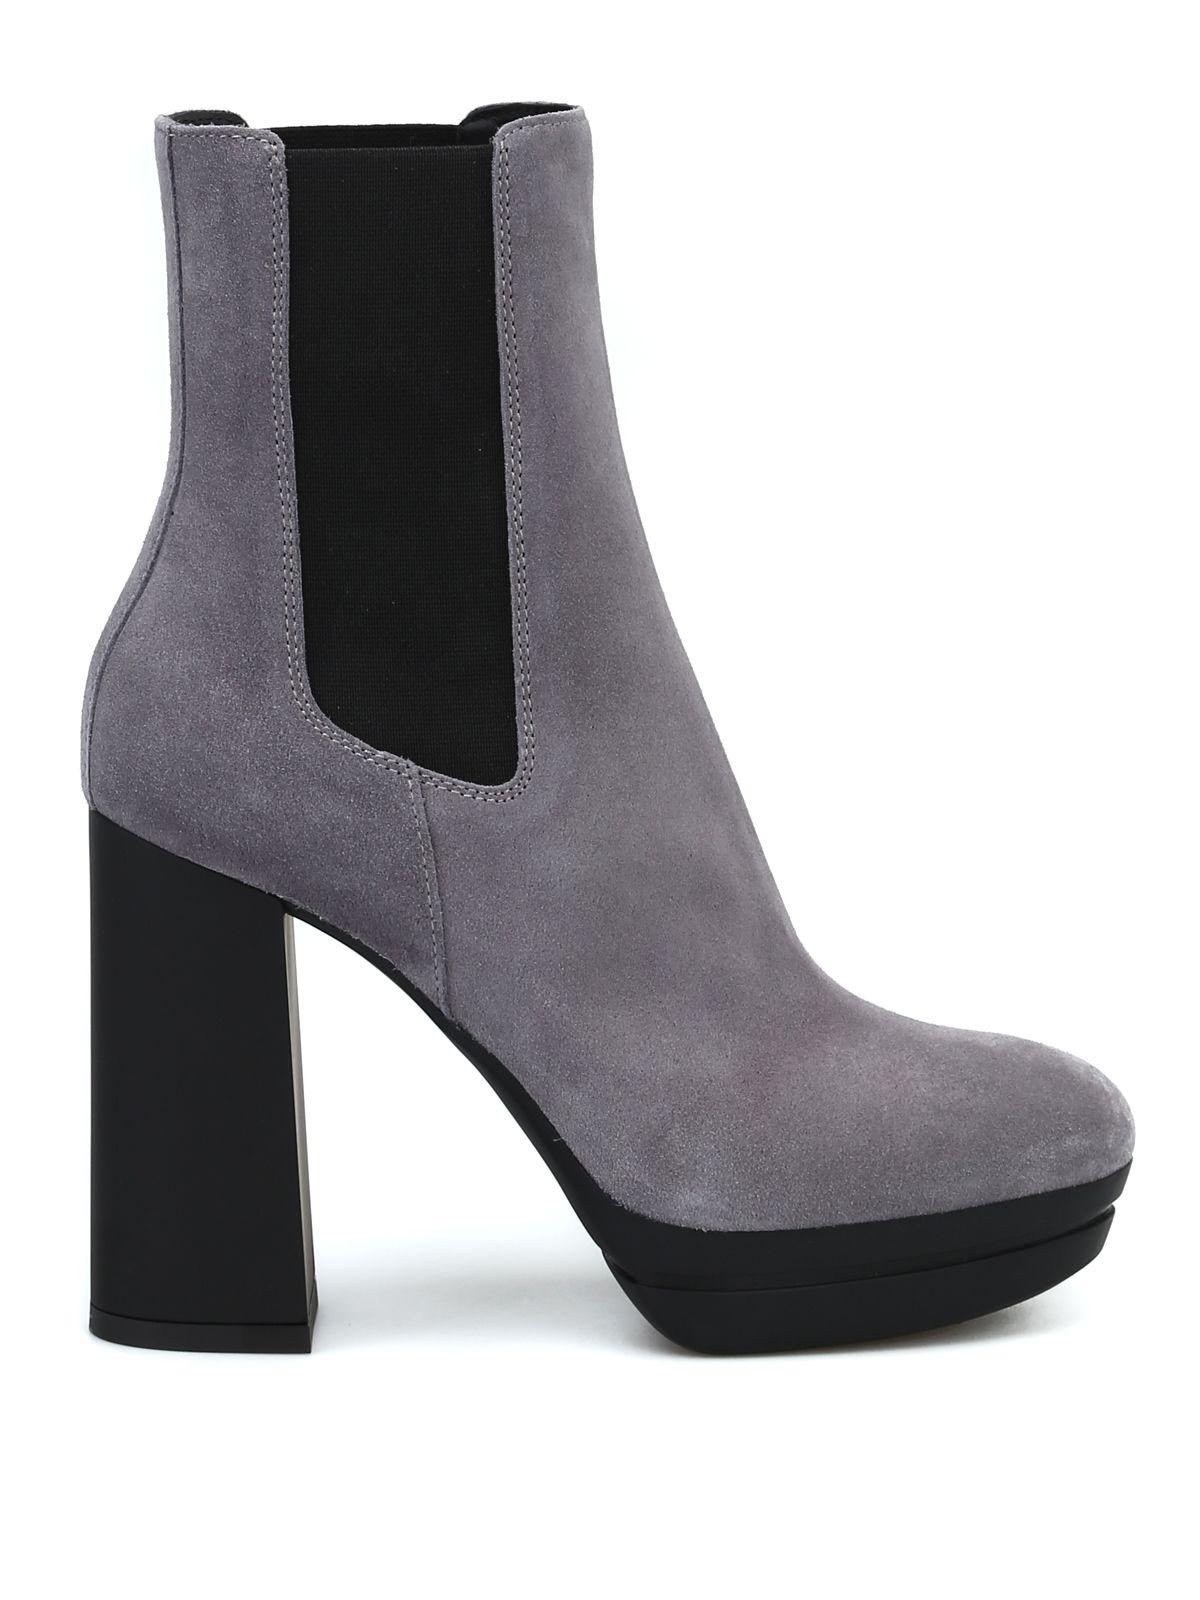 bb674ac219 Hogan Hogan Women's Hogan H391 Ankle Boots - Dark grey - 10711086 ...